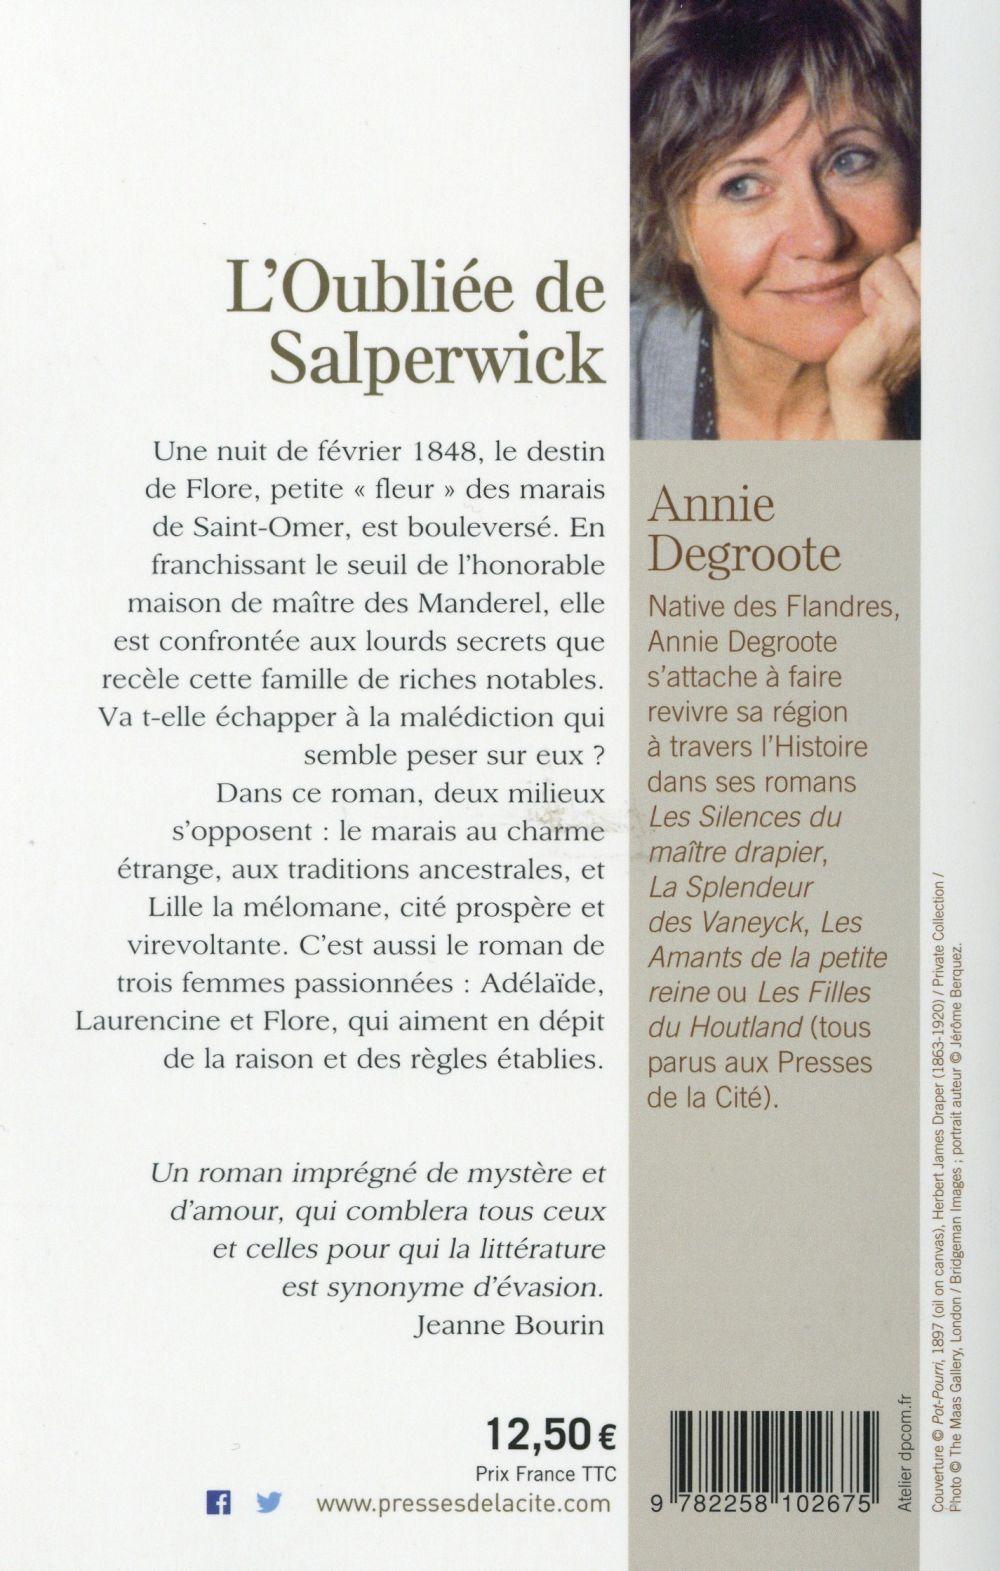 L'oubliée de Salperwick